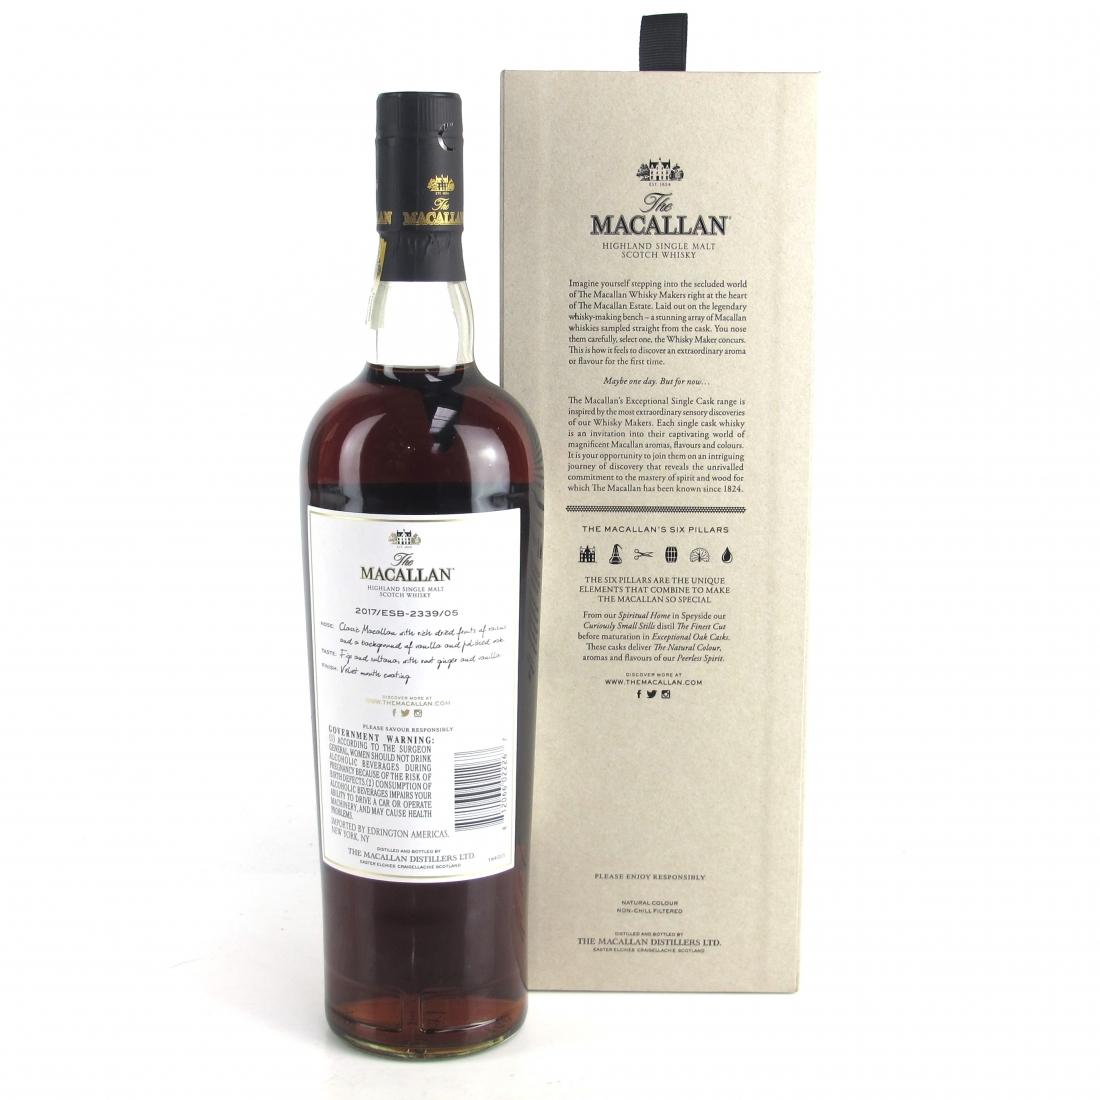 Macallan 2002 Exceptional Cask #2339-05 / US Import 75cl